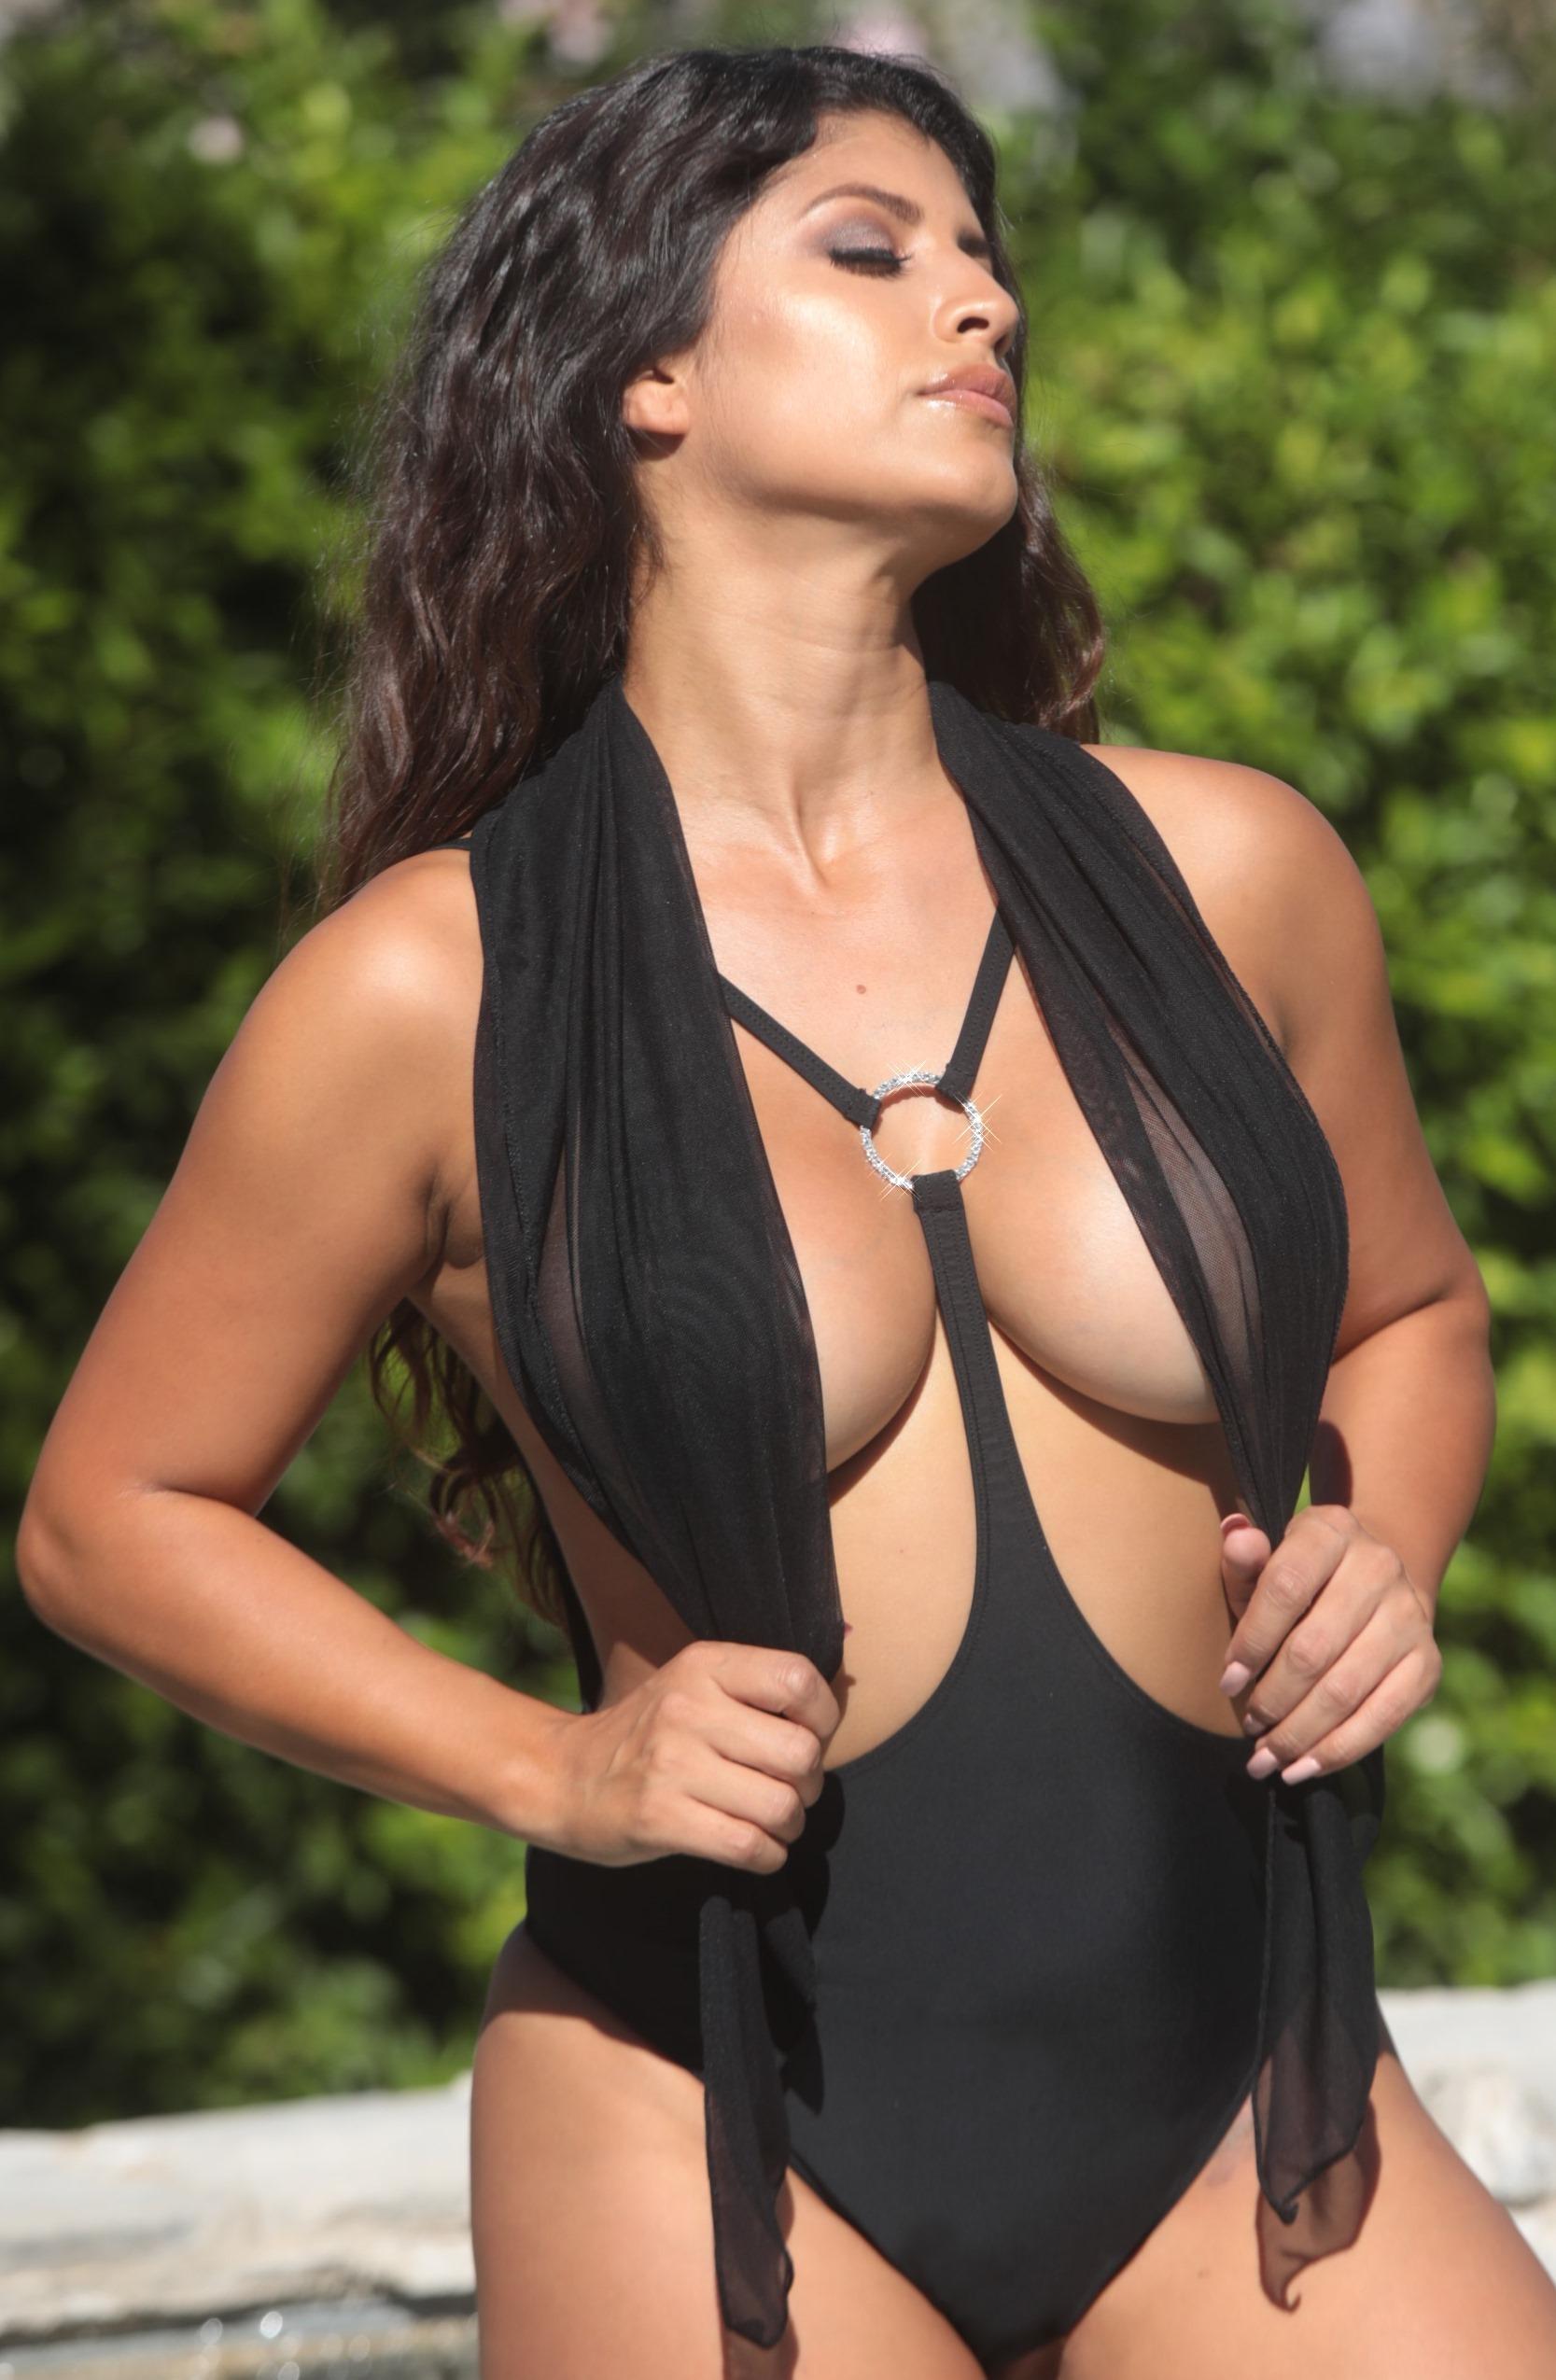 Topless Jewel One Piece Swimsuit